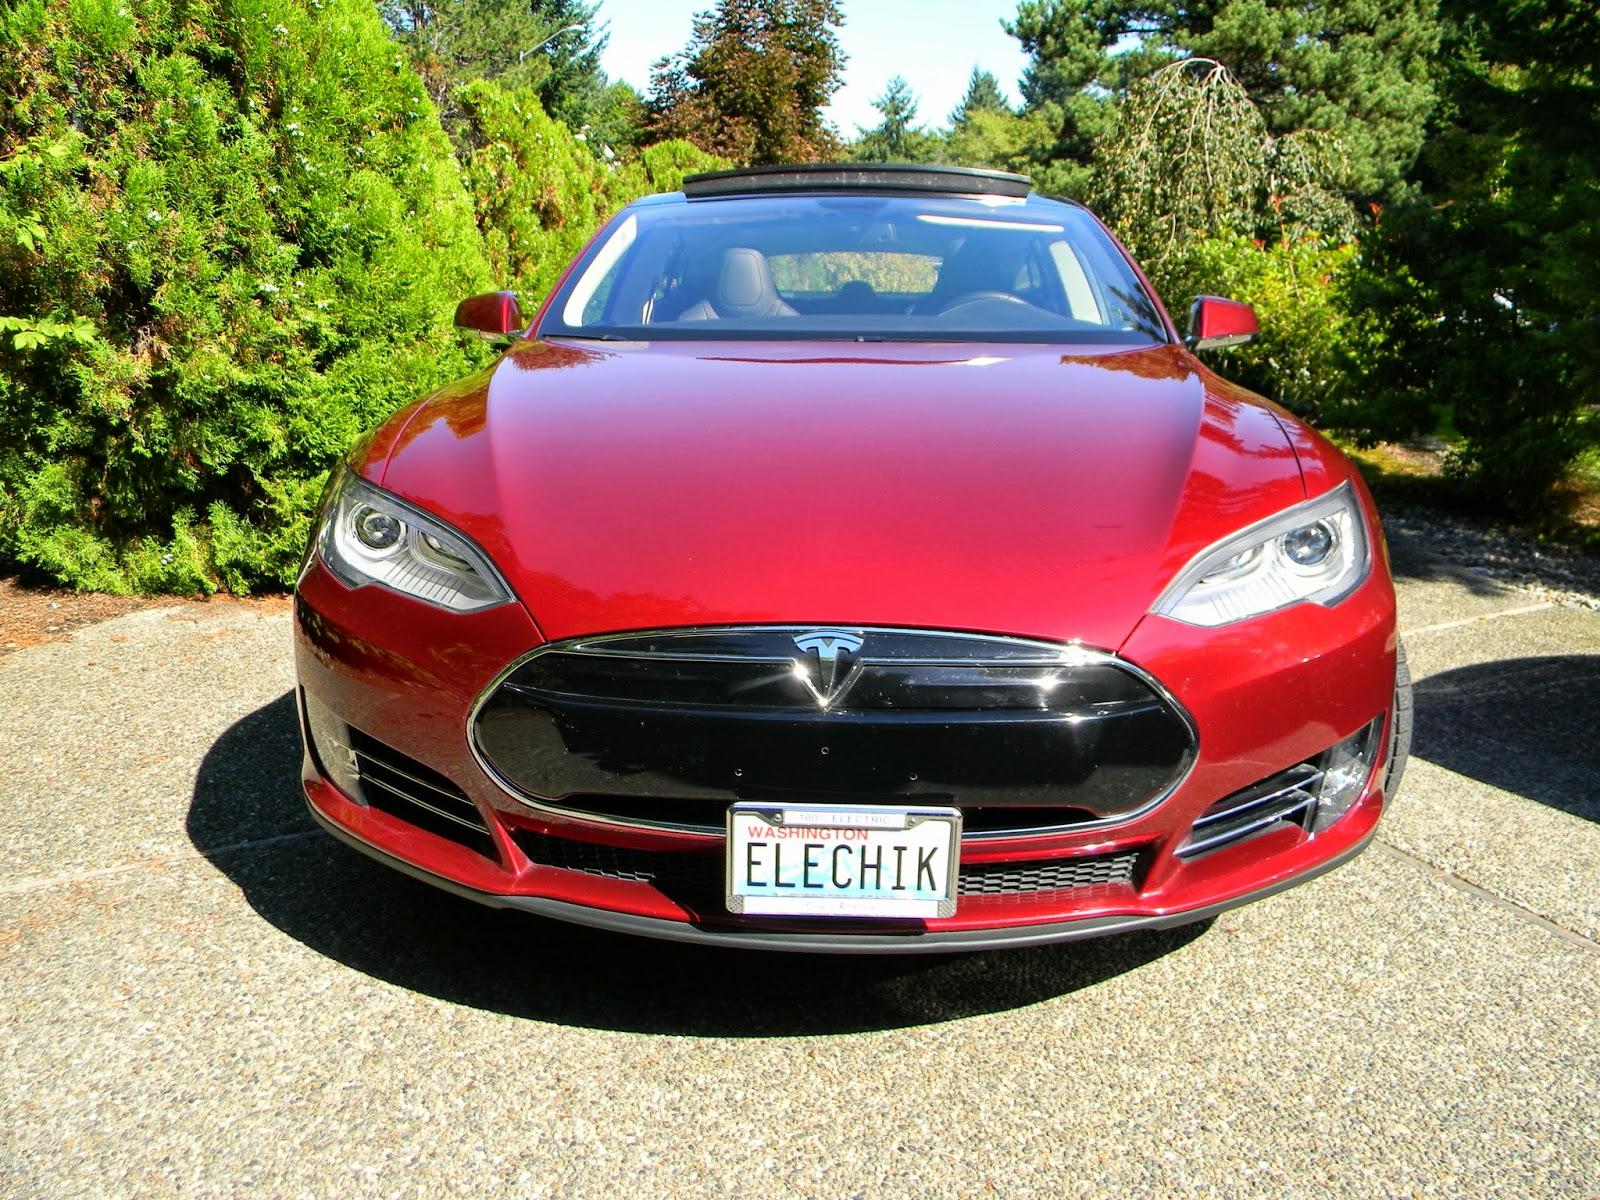 Best Uber Cars >> Best Tesla License Plates [Gallery] - Electrek